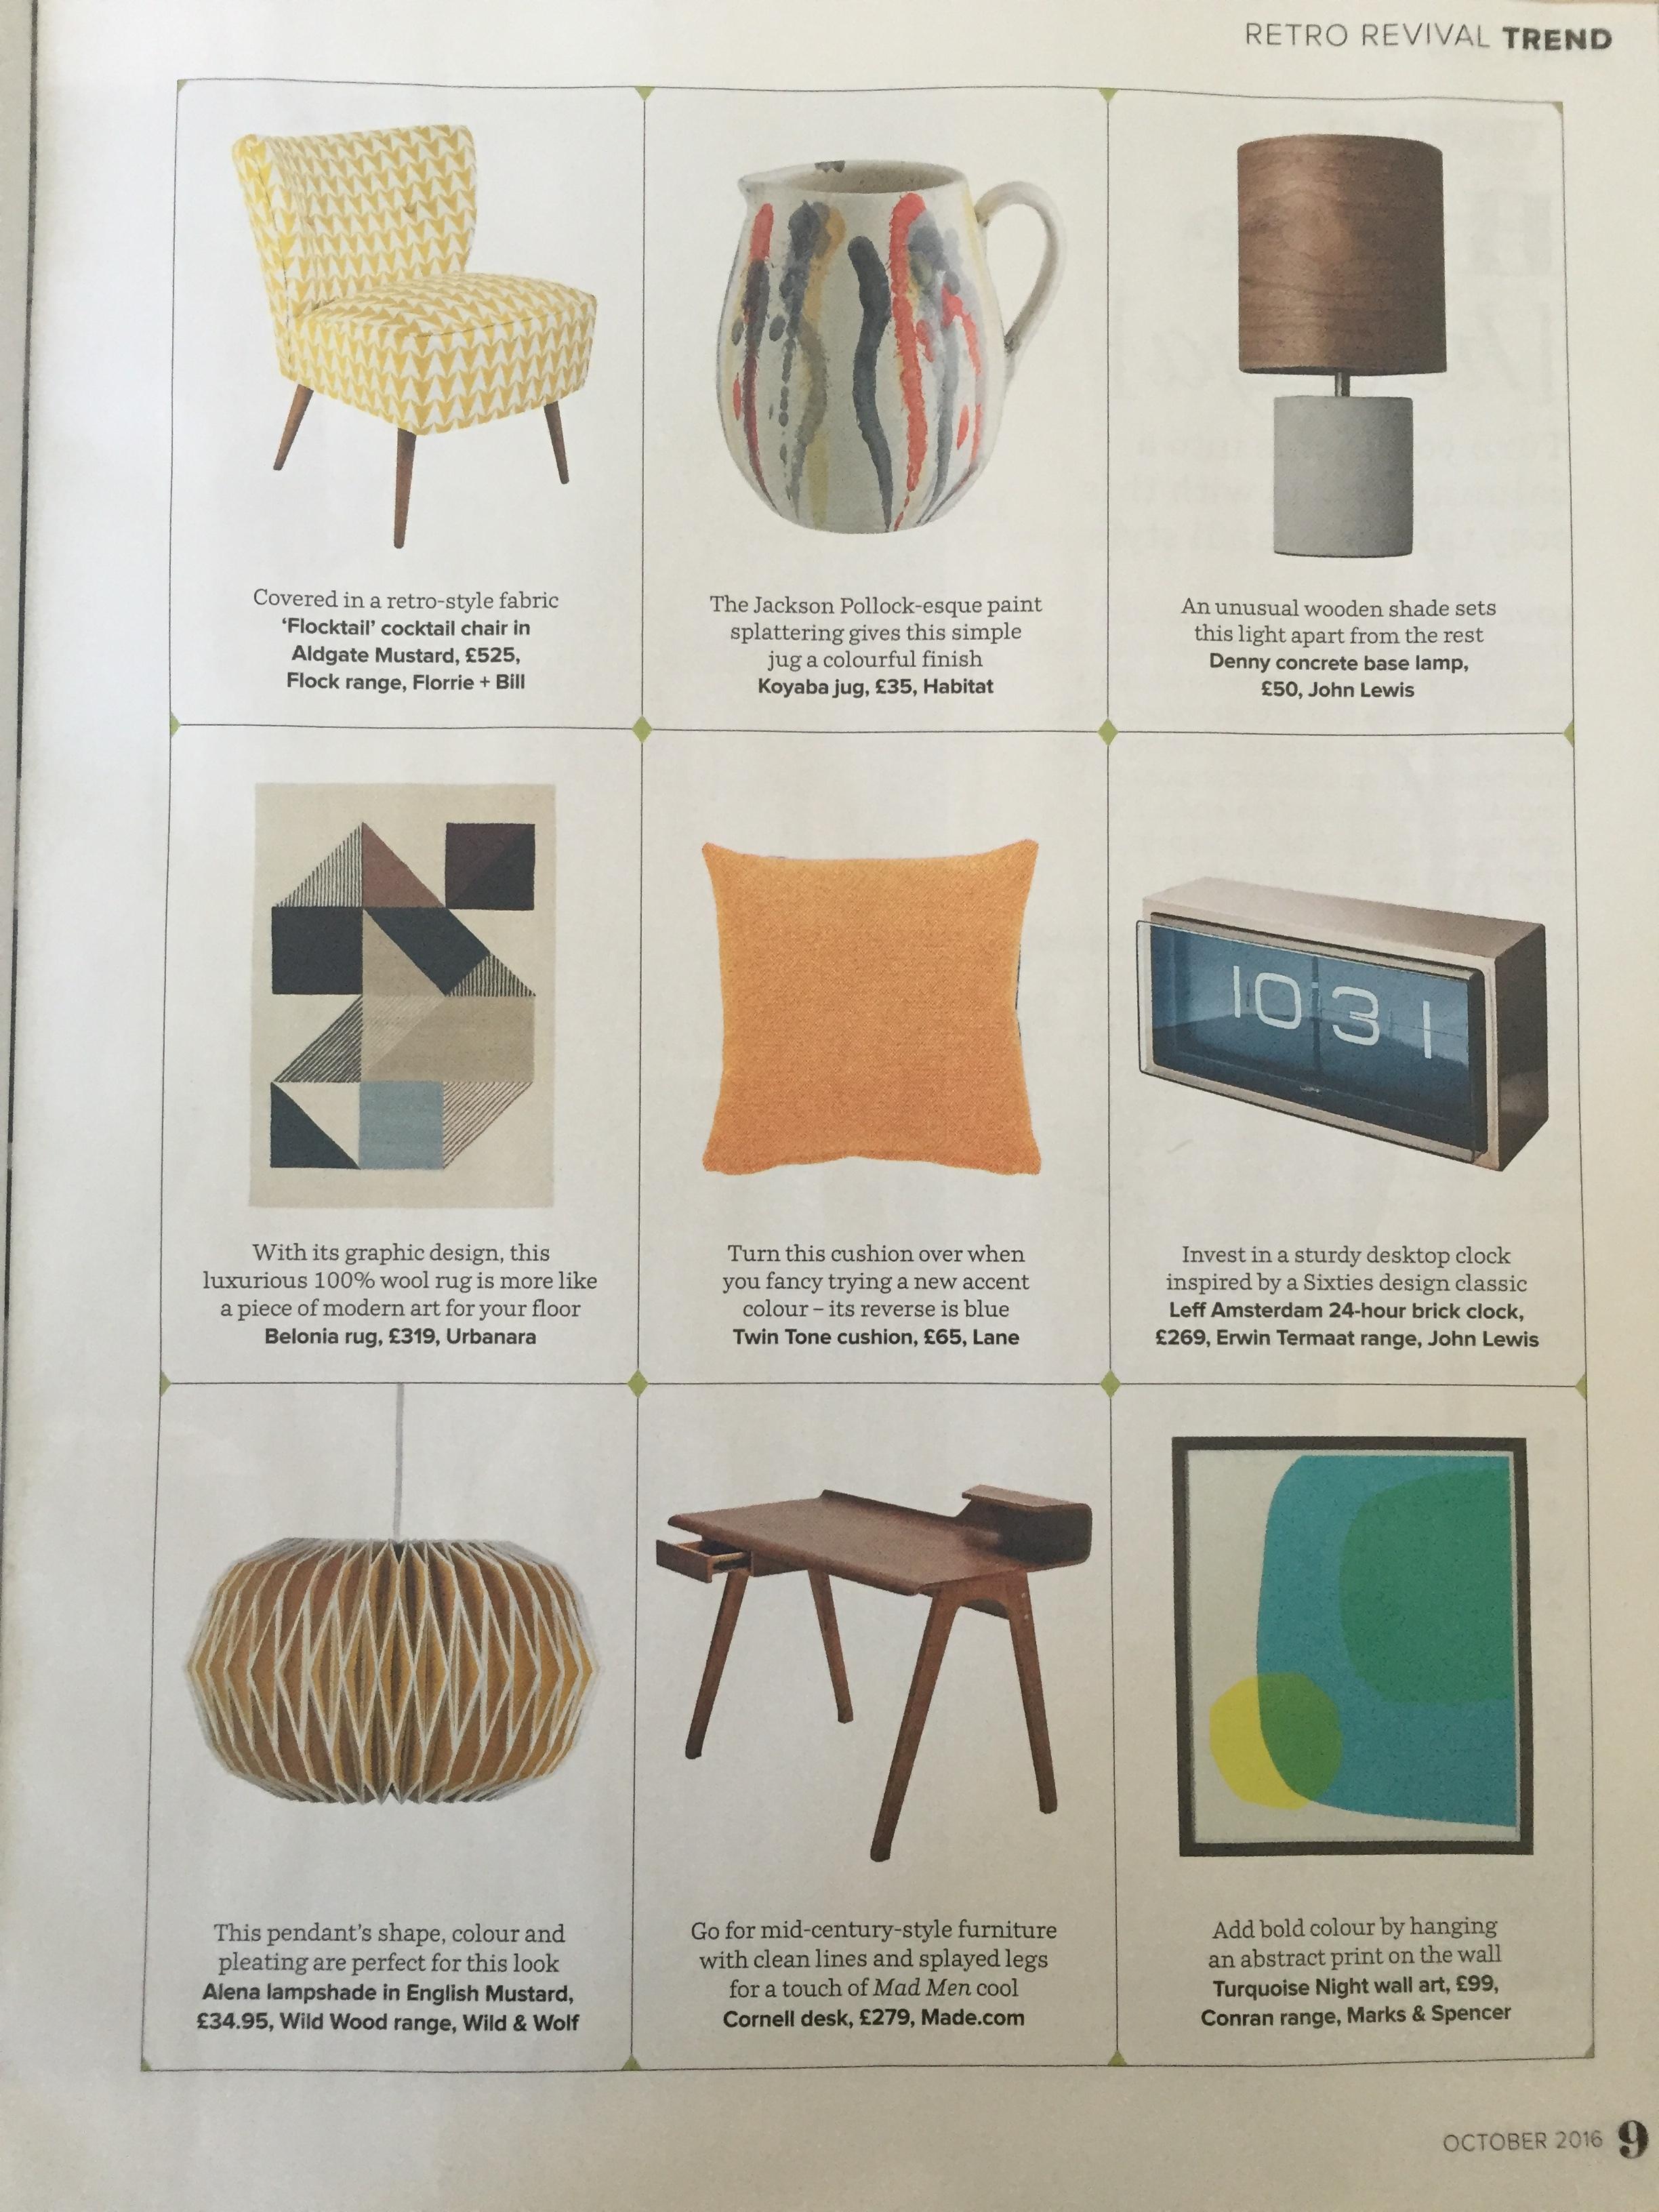 Ideal Home, October 2016, Lane Twin Tone Cushion -  Seville Orange & Mallard Blue